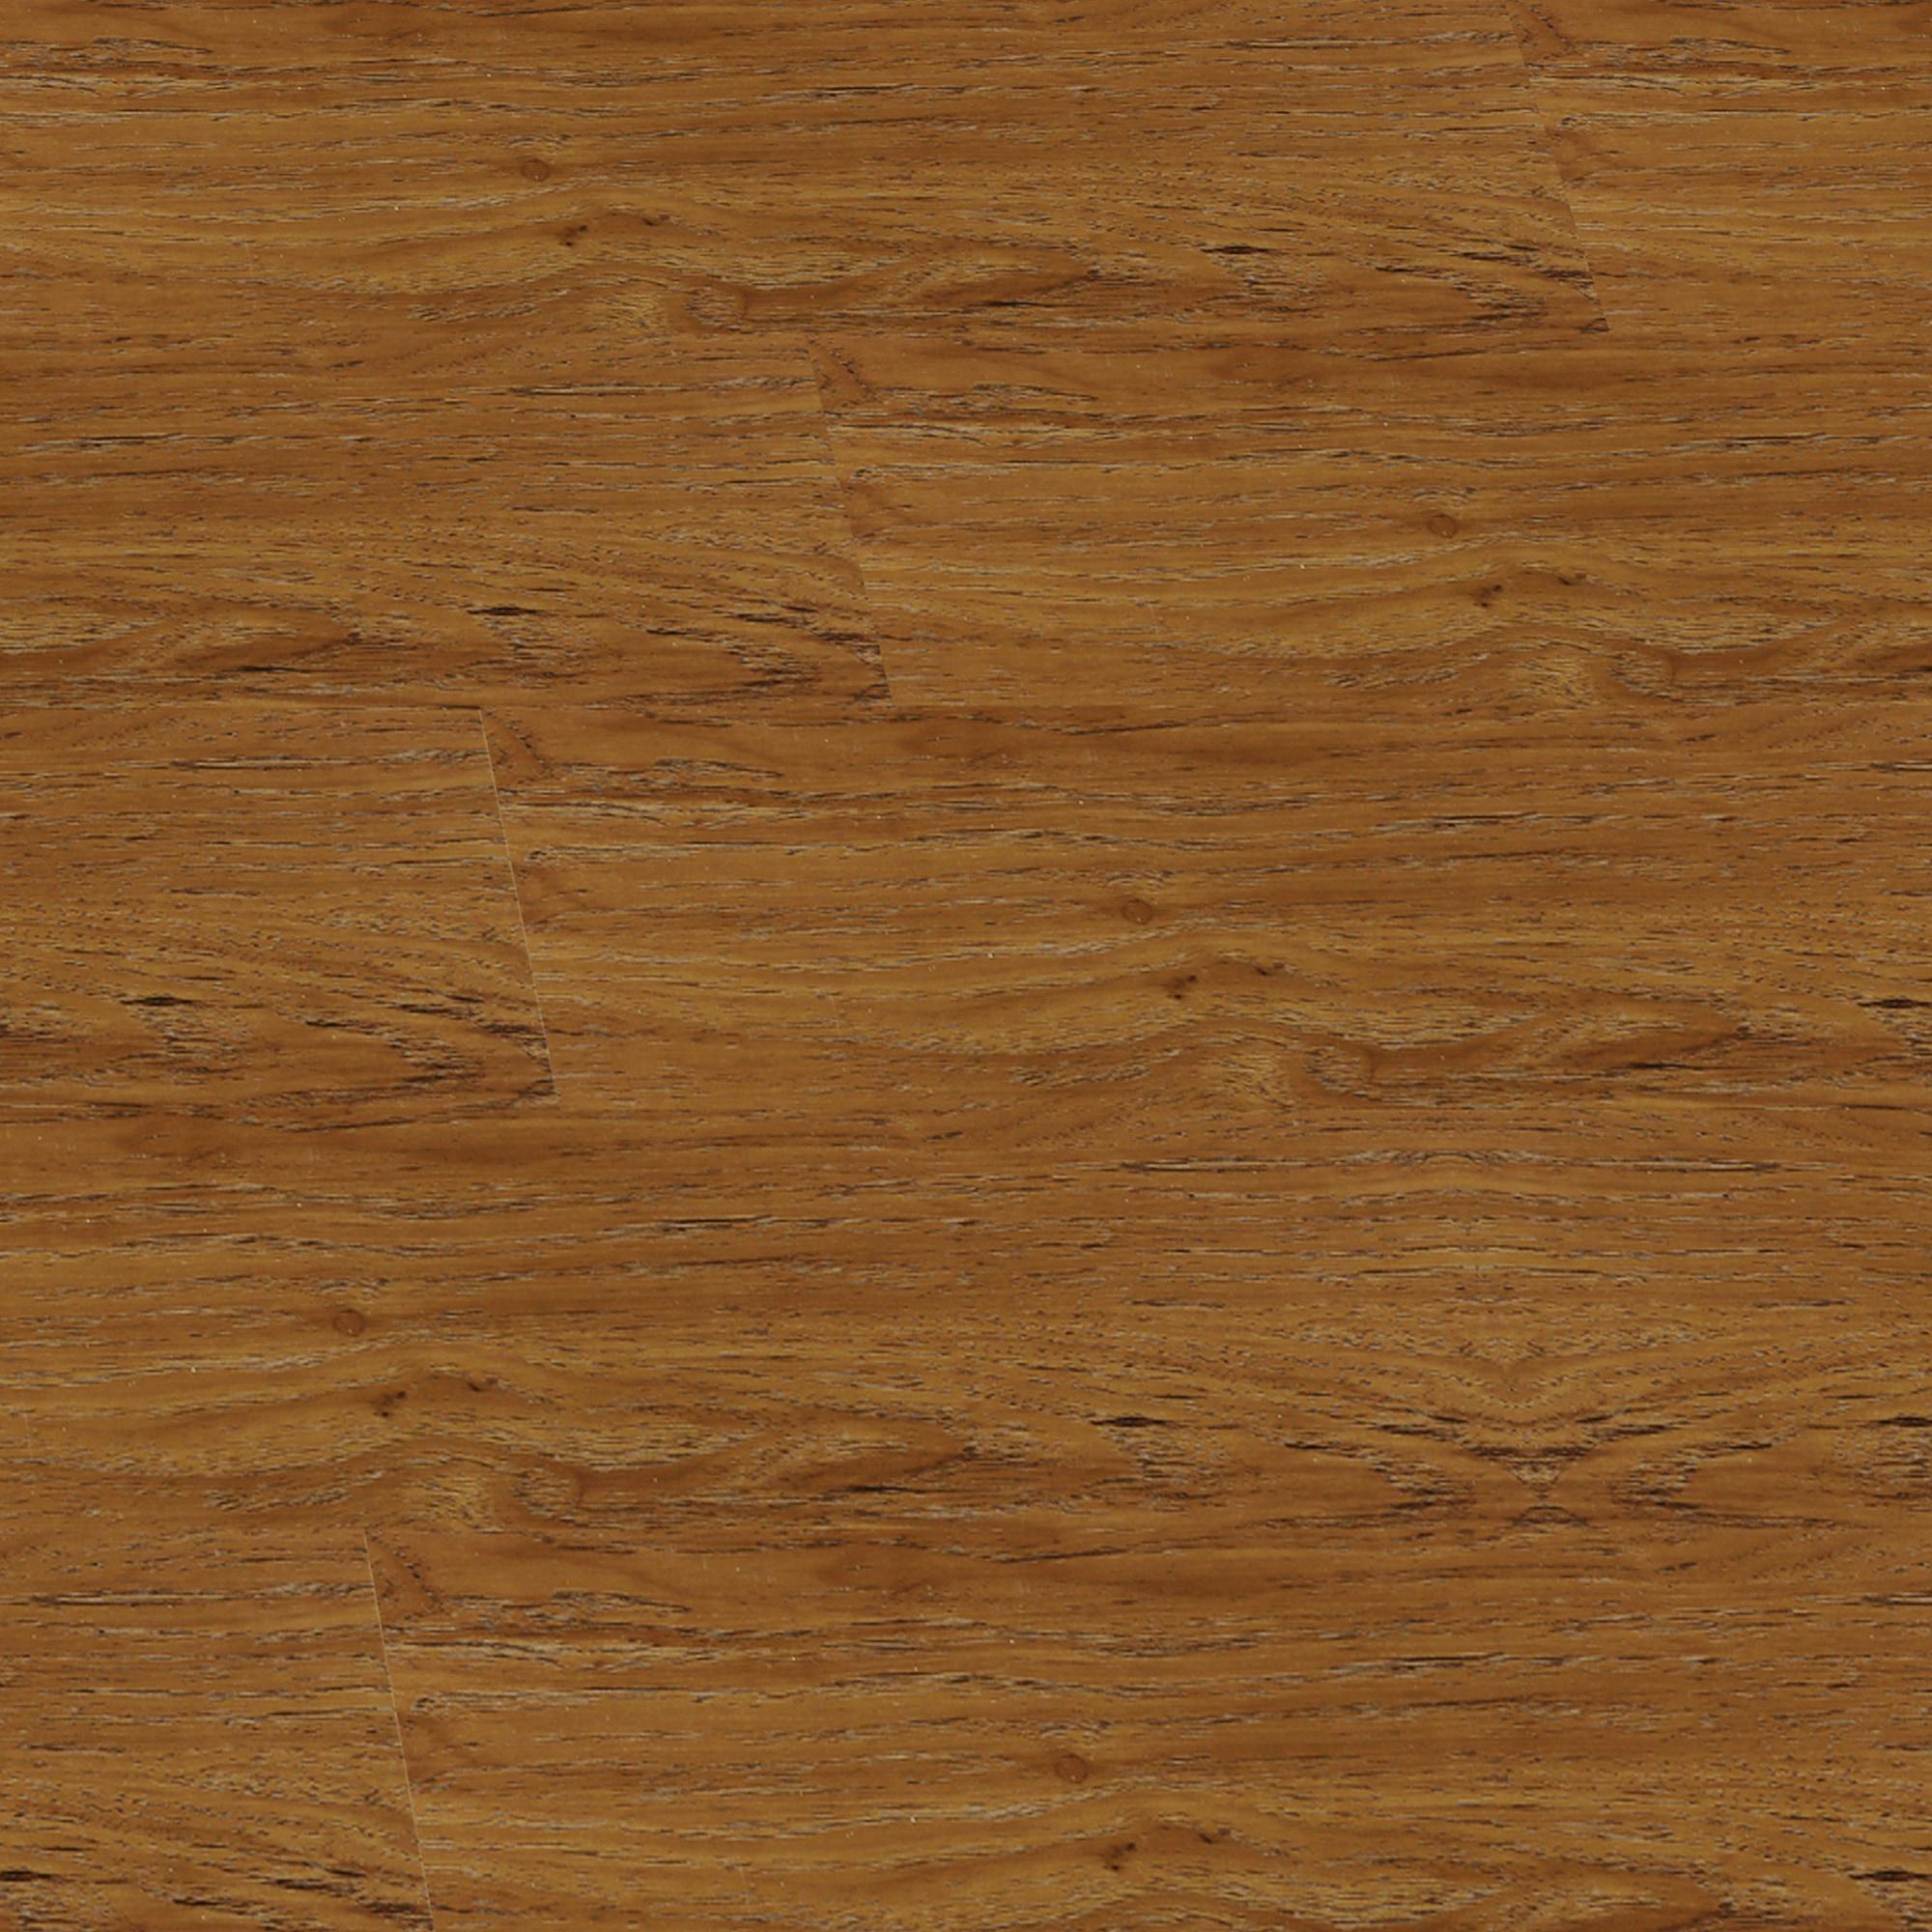 Medium Oak / 2mm / PVC / Peel & Stick Vinyl Planks - 2mm PVC Peel & Stick - Sterling Collection 0